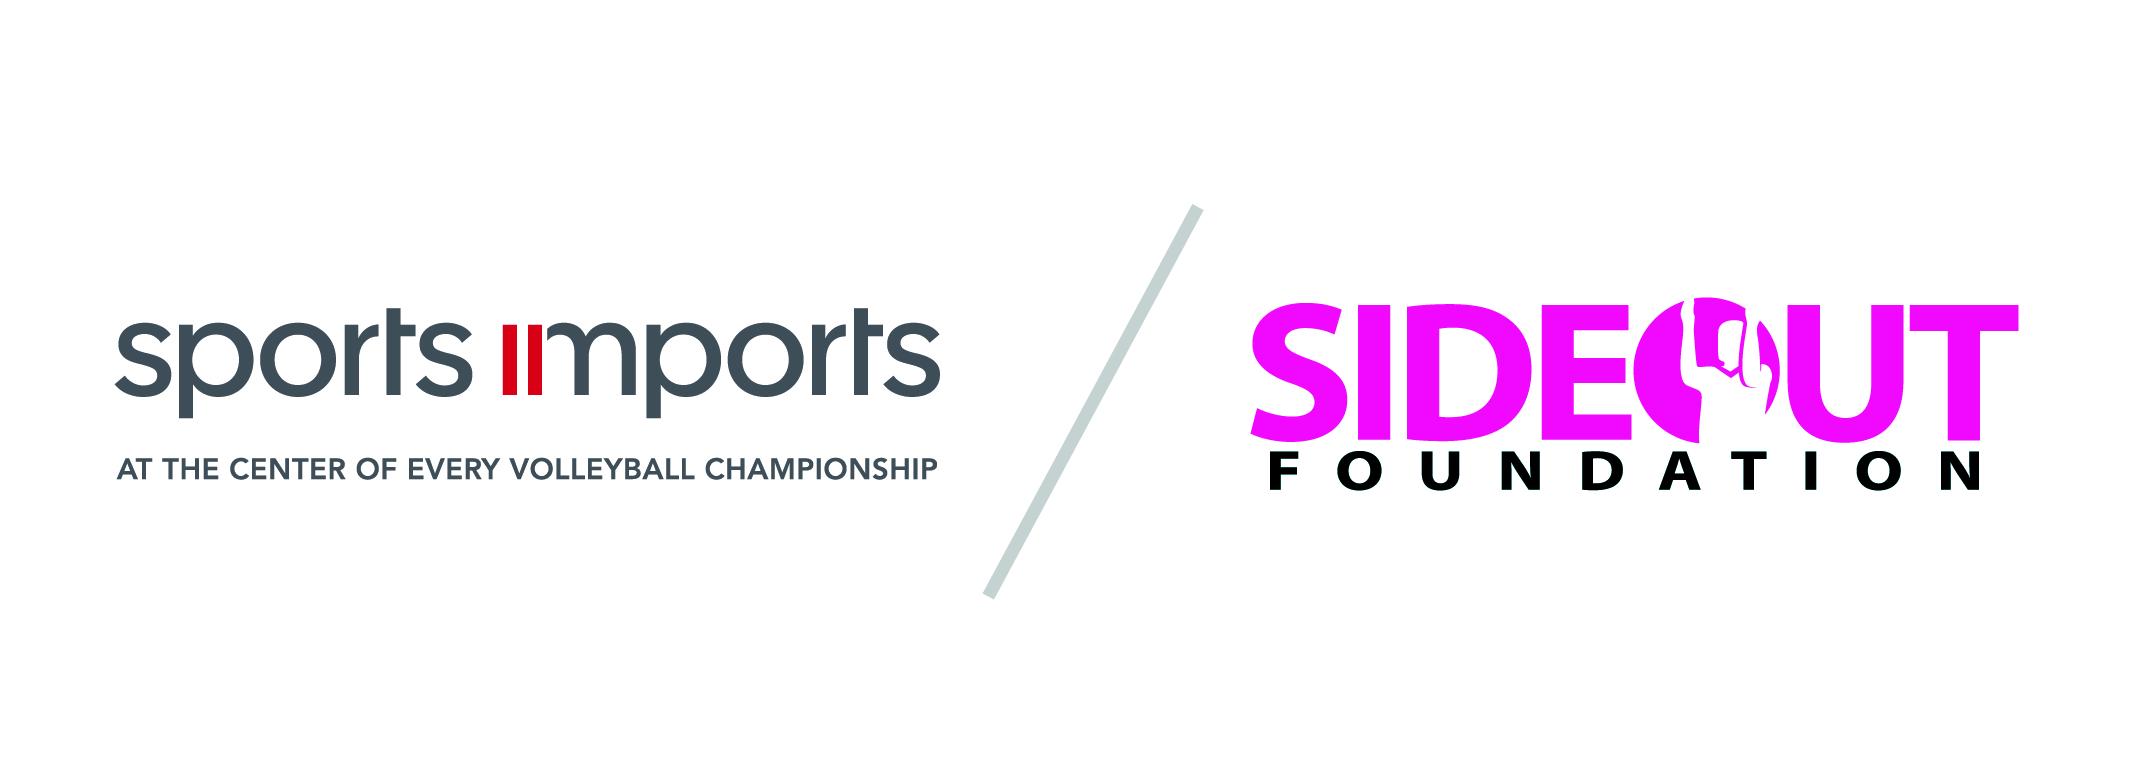 Side-Out Foundation Dig Pink